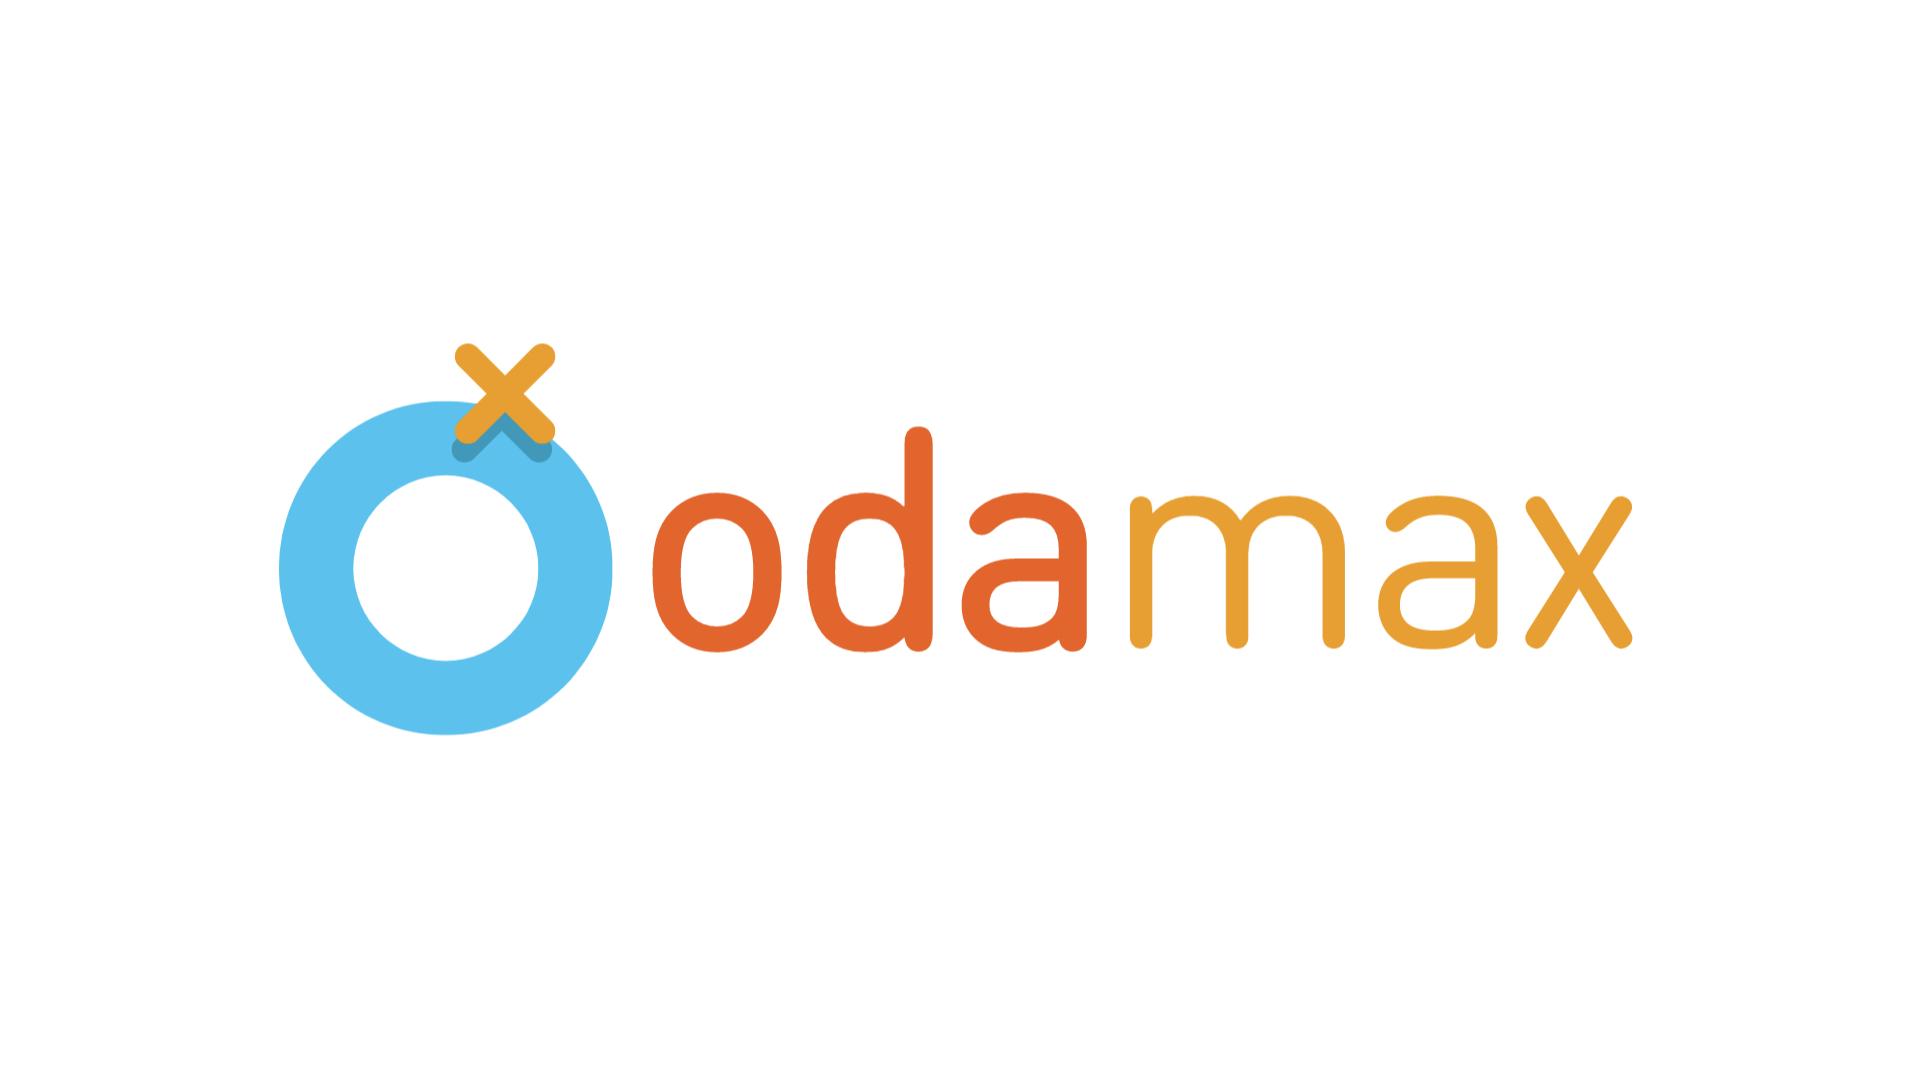 odamax